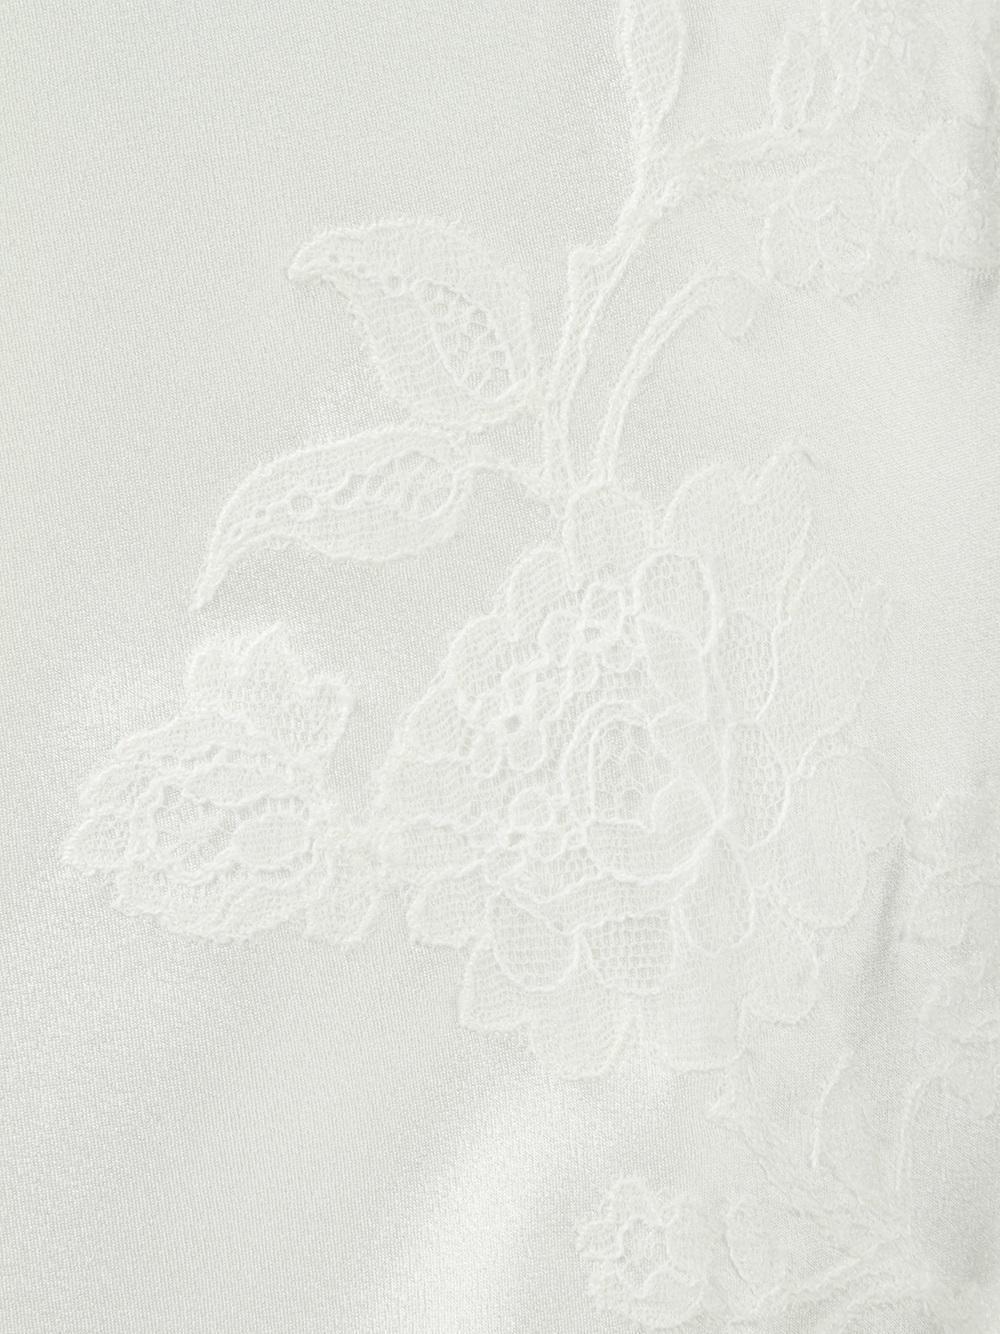 1071ebffcb75 Carine Gilson - White Lace V-neck Slip - Lyst. View fullscreen